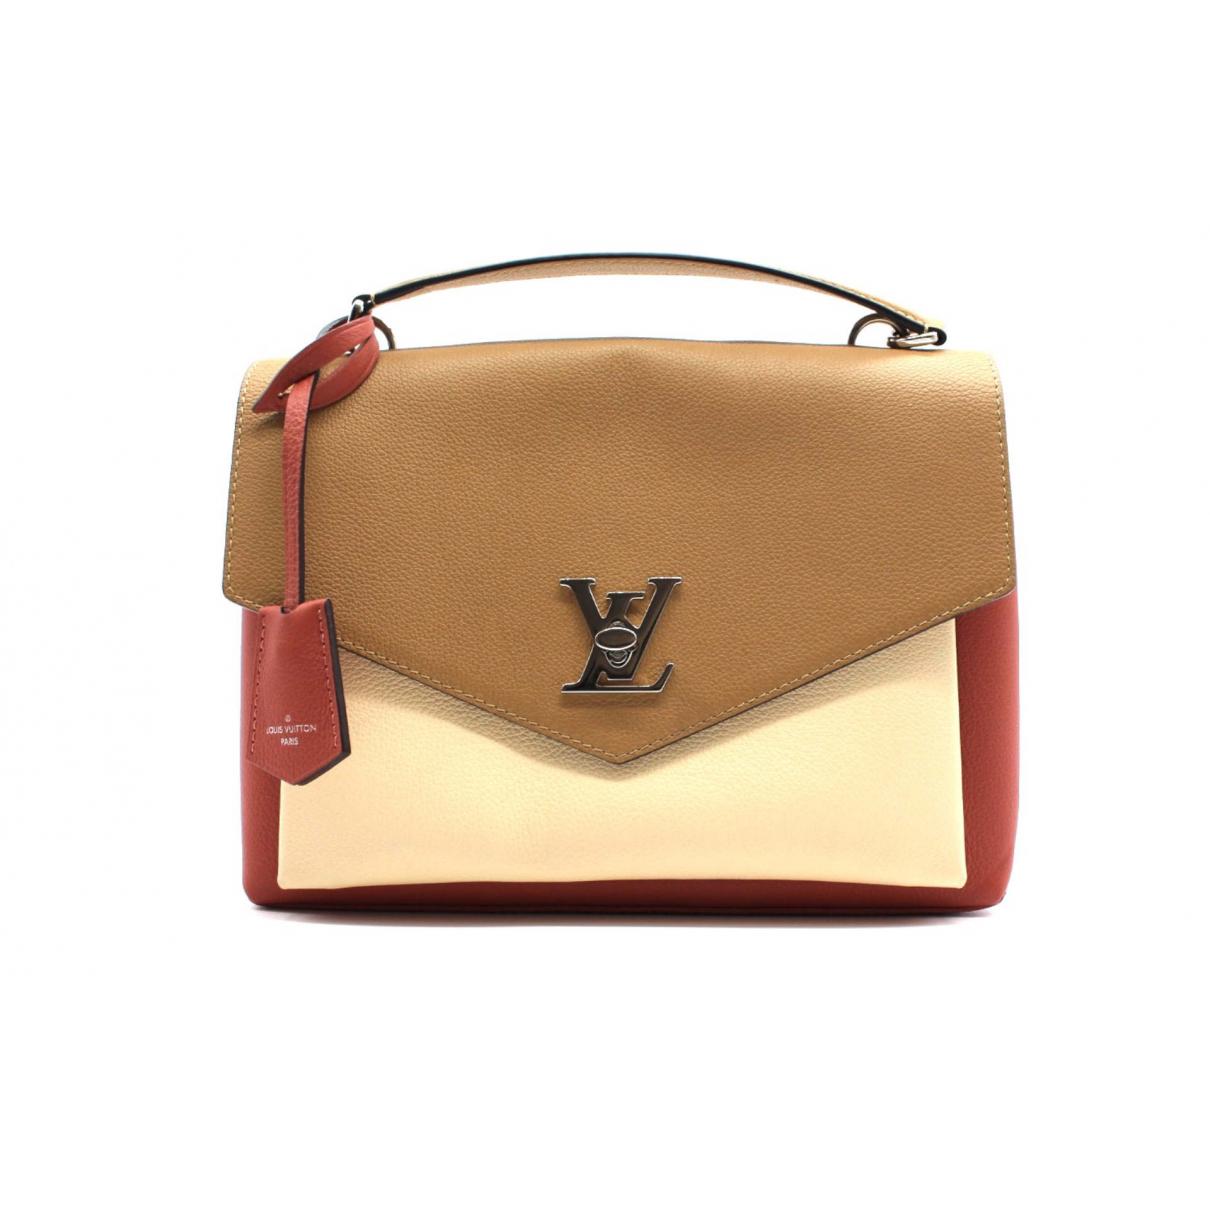 Louis Vuitton Mylockme Leather handbag for Women N